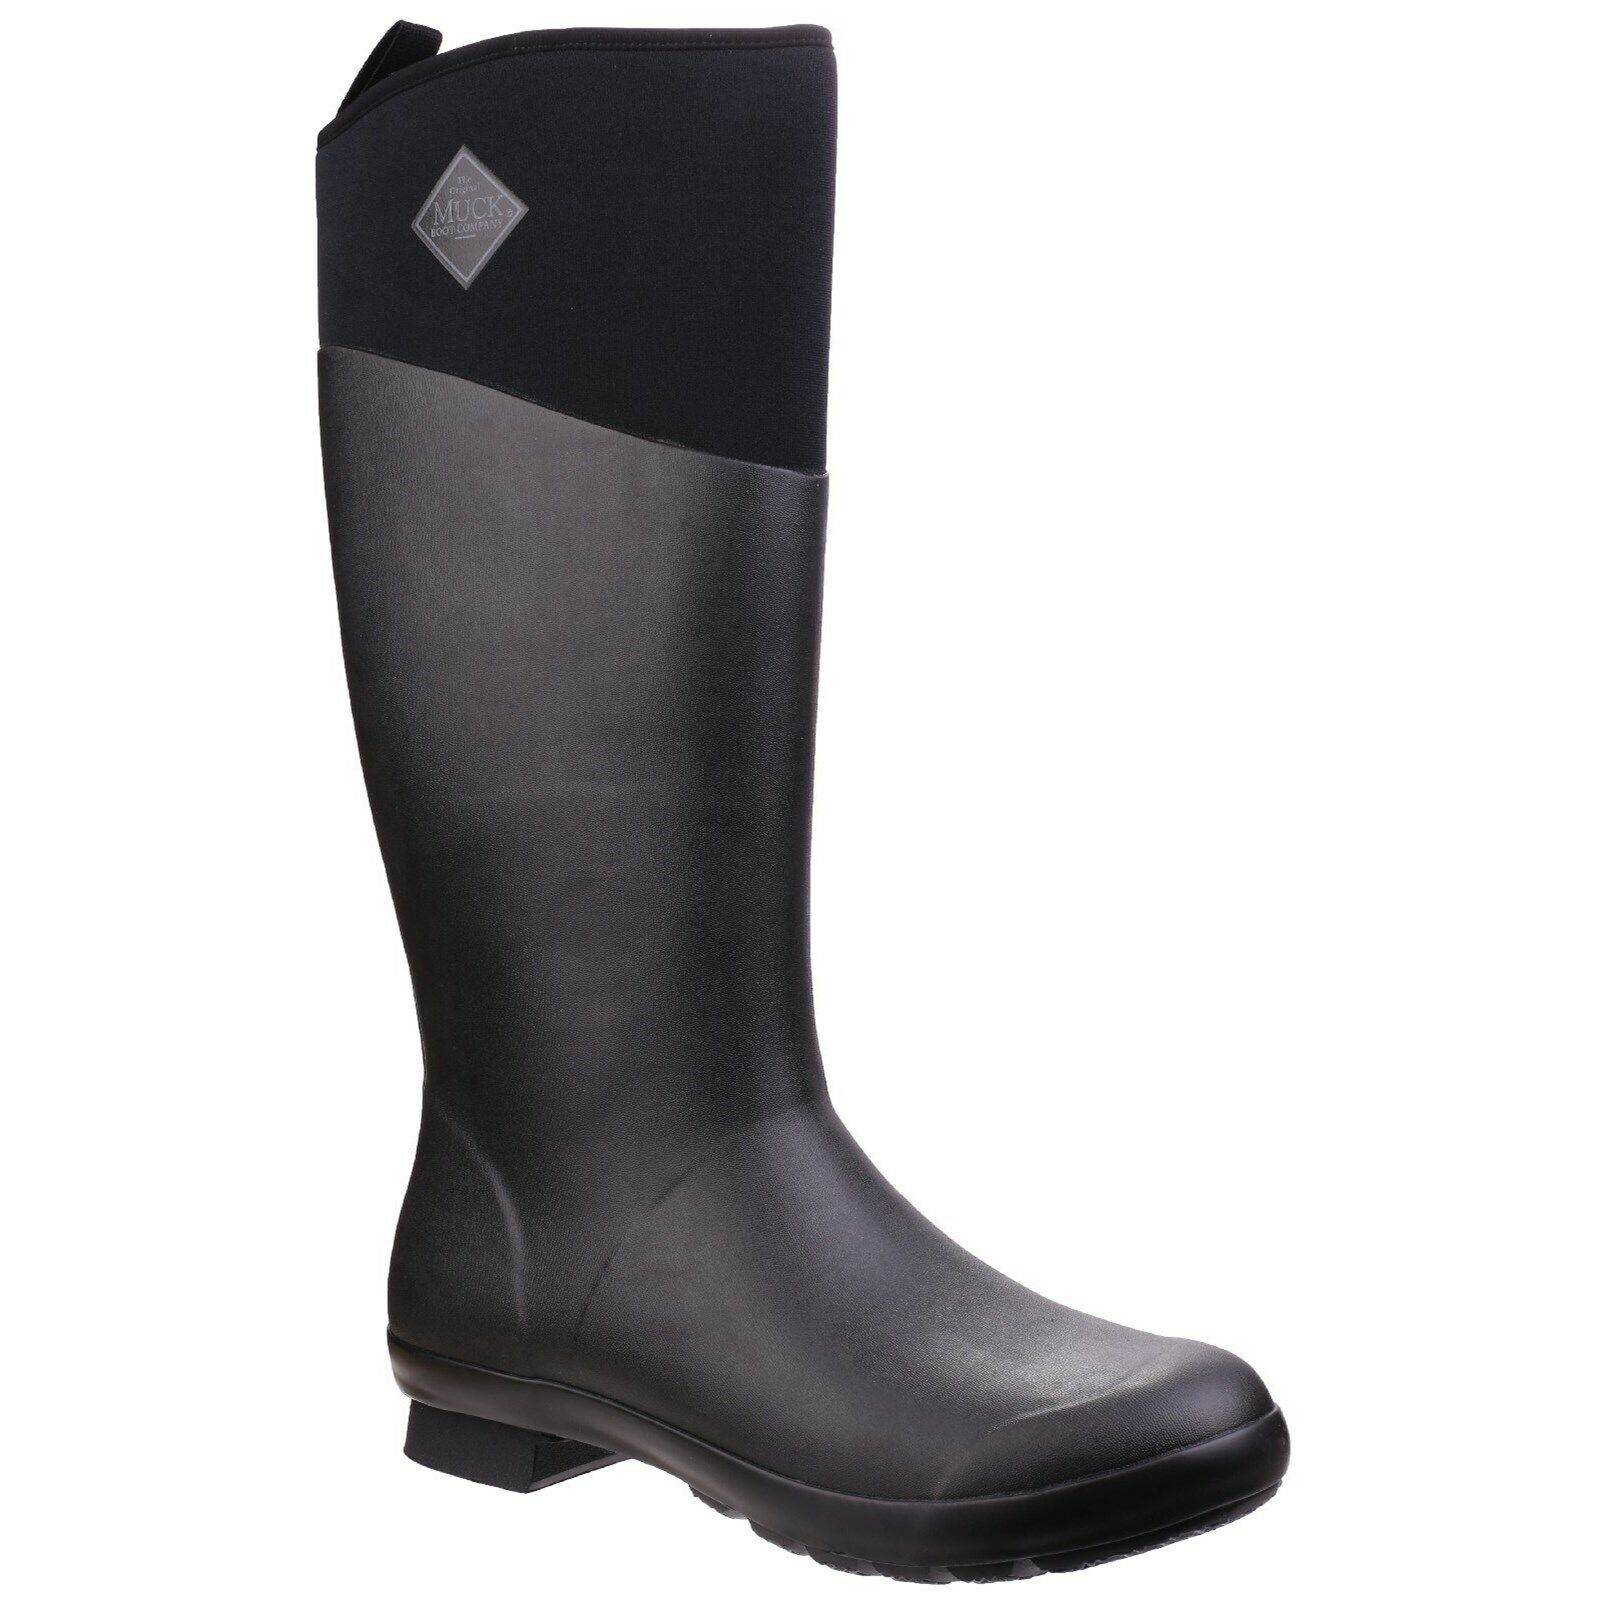 Muck botas Tremont Mujer Wellington Altos Impermeable de Agua Bota